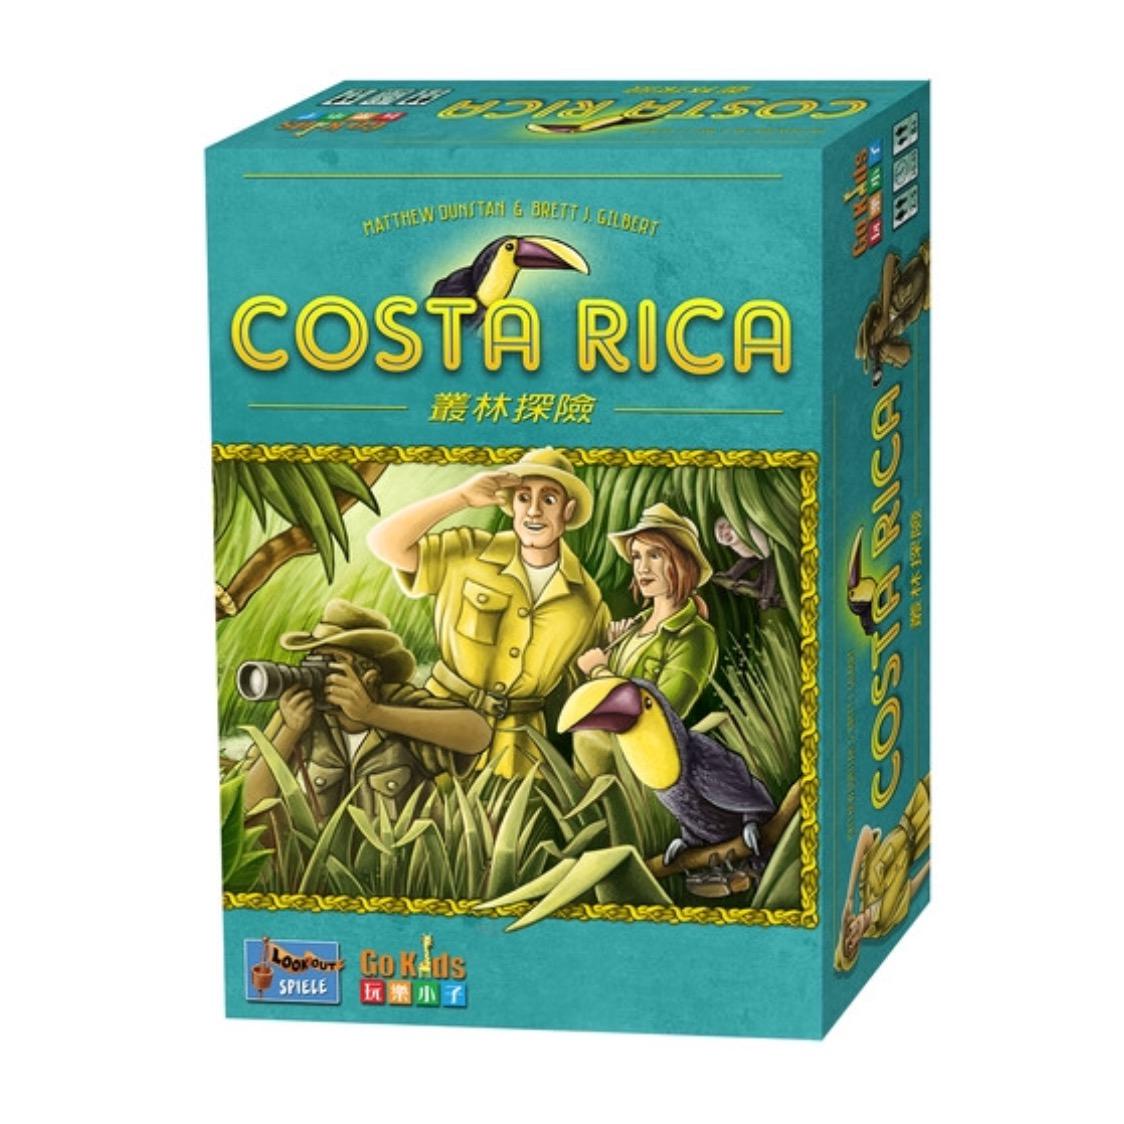 Costa Rica für 18,89€ inkl. VSK (statt 23,99€) [spiele-offensive.de]